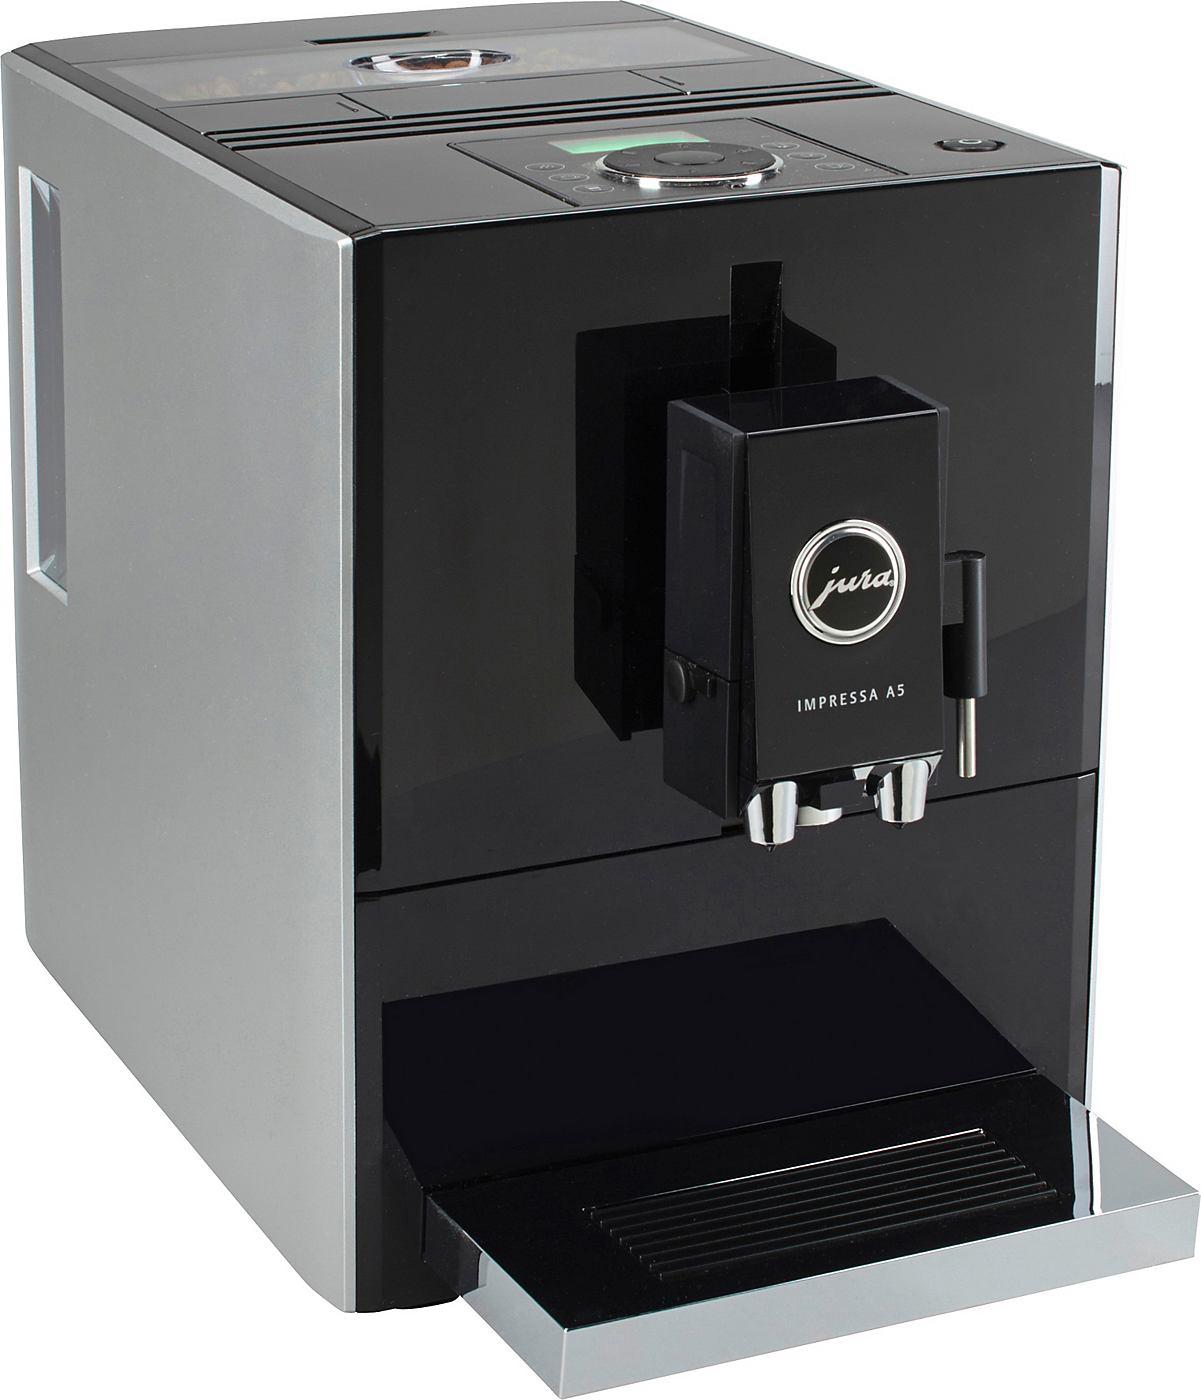 JURA Espresso-/Kaffee-Vollautomat »IMPRESSA A5 One Touch 13663«